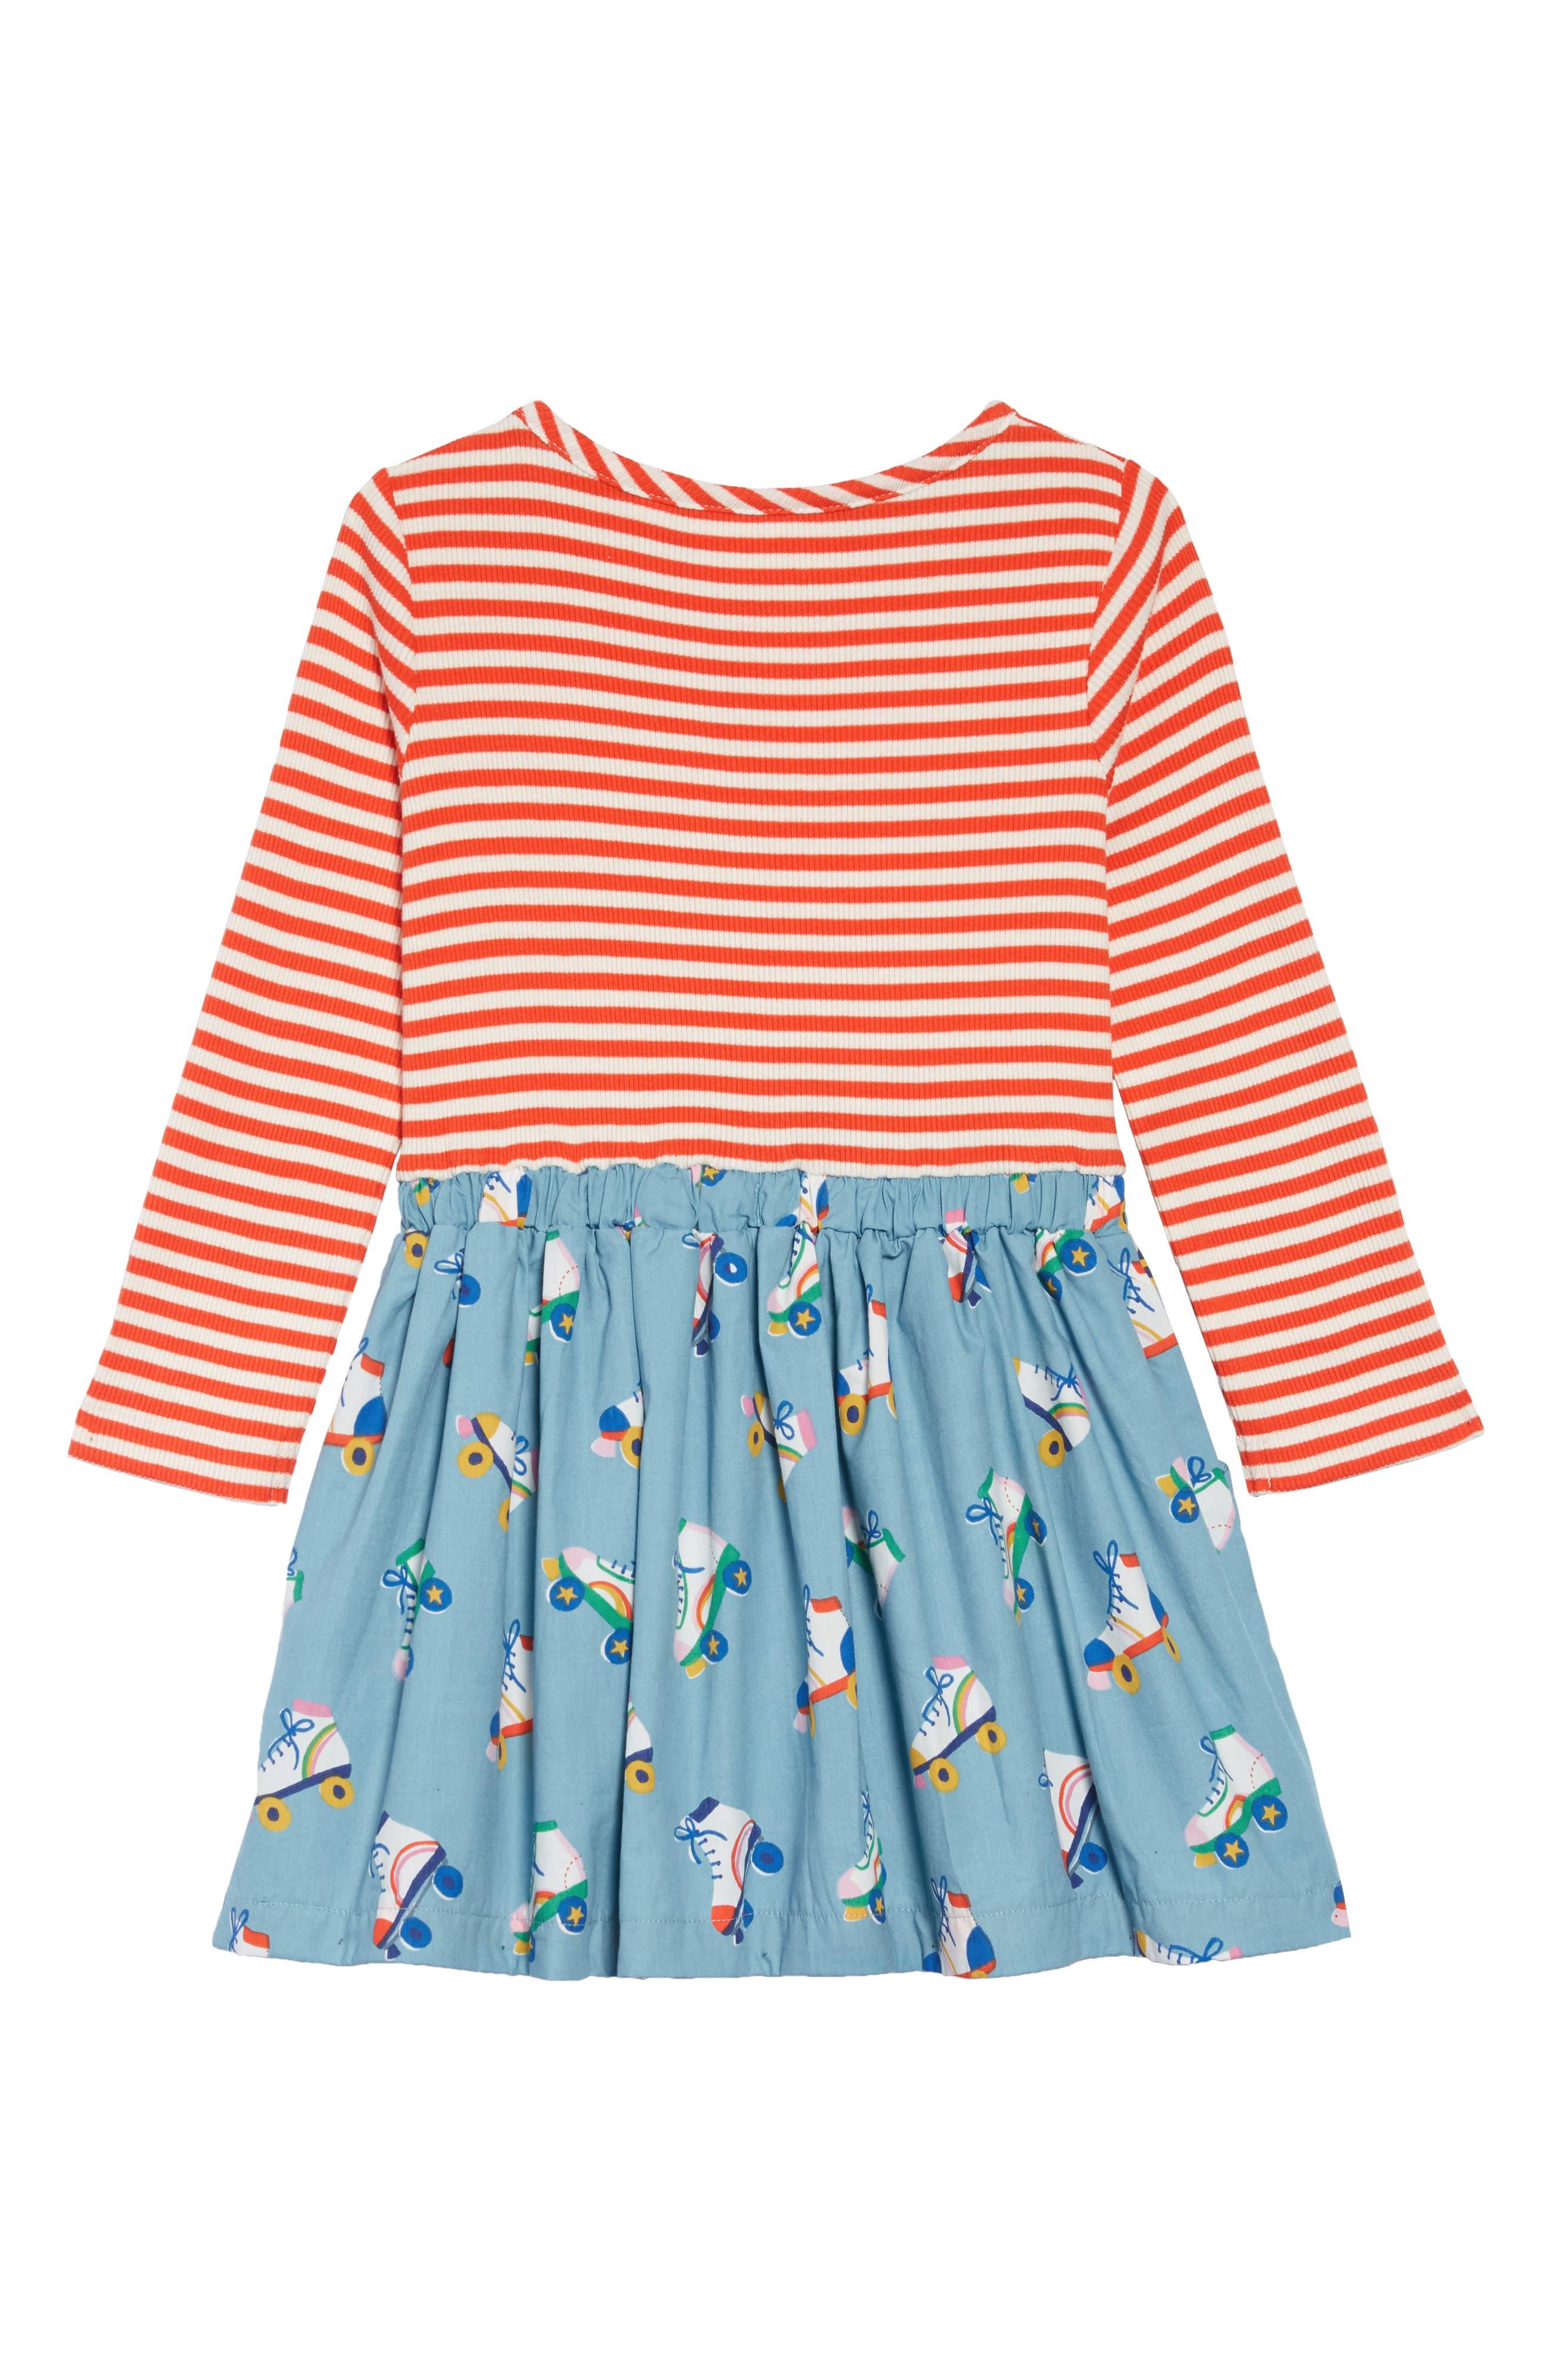 Hopscotch Dress,                             Alternate thumbnail 2, color,                             BLUE ROLLER SKATES